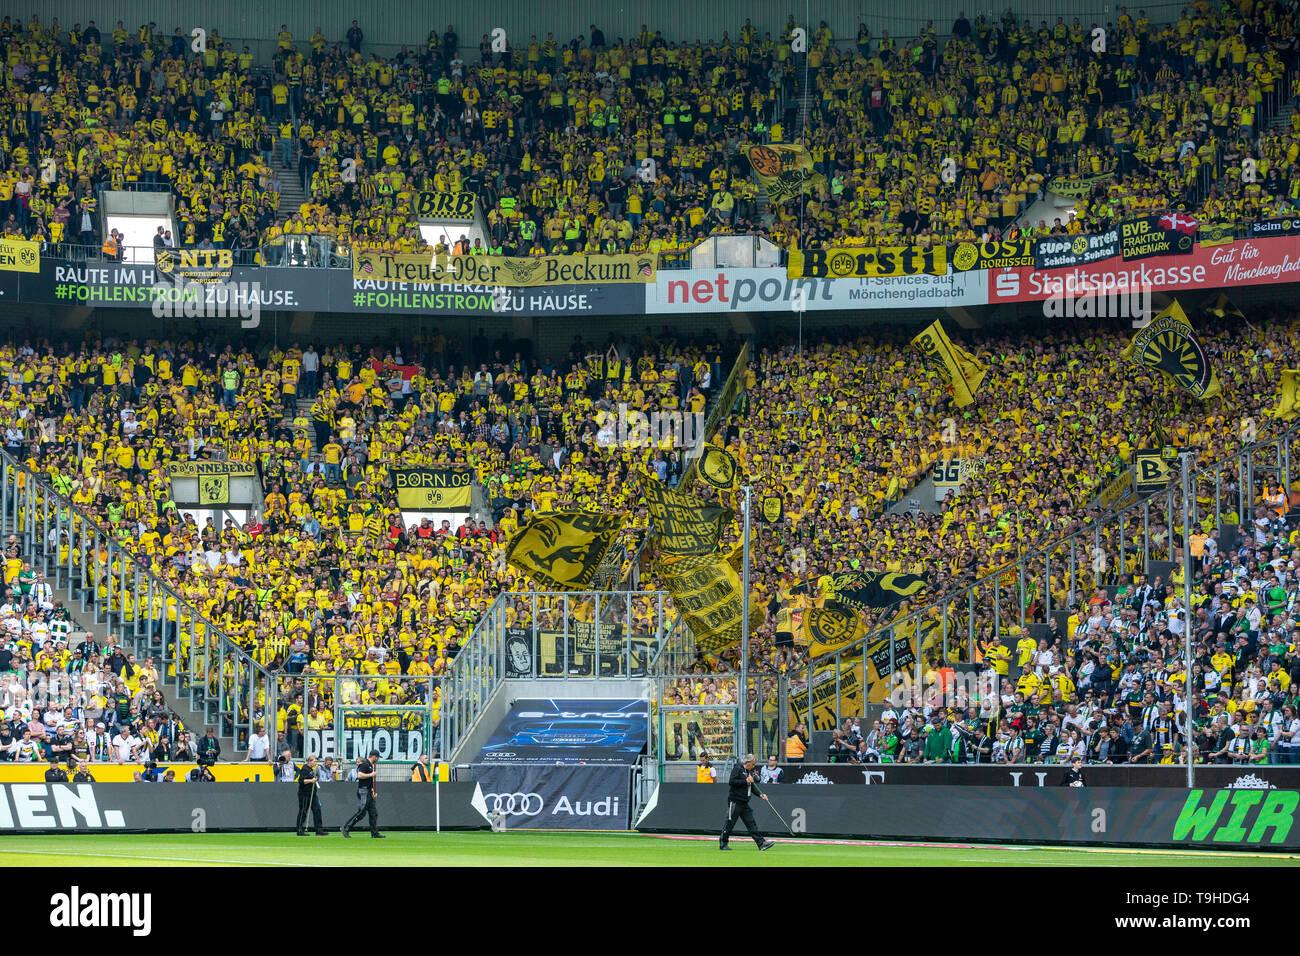 Sport, Fussball, Bundesliga, 2018/2019, Borussia Moenchengladbach vs. BVB Borussia Dortmund 0-2, Stadion Borussia-Park, Zuschauerkulisse, Gaesteblock, Dortmunder Fussballfans, DFL REGULATIONS PROHIBIT ANY USE OF PHOTOGRAPHS AS IMAGE SEQUENCES AND/OR QUASI-VIDEO, sports, football, Bundesliga, 2018/2019, Borussia Moenchengladbach vs. BVB Borussia Dortmund 0-2, Stadium Borussia Park, Dortmund football fans in the supporters section, DFL REGULATIONS PROHIBIT ANY USE OF PHOTOGRAPHS AS IMAGE SEQUENCES AND/OR QUASI-VIDEO *** Local Caption *** sports, football, Bundesliga, 2018/2019, Borussia Moenchen - Stock Image